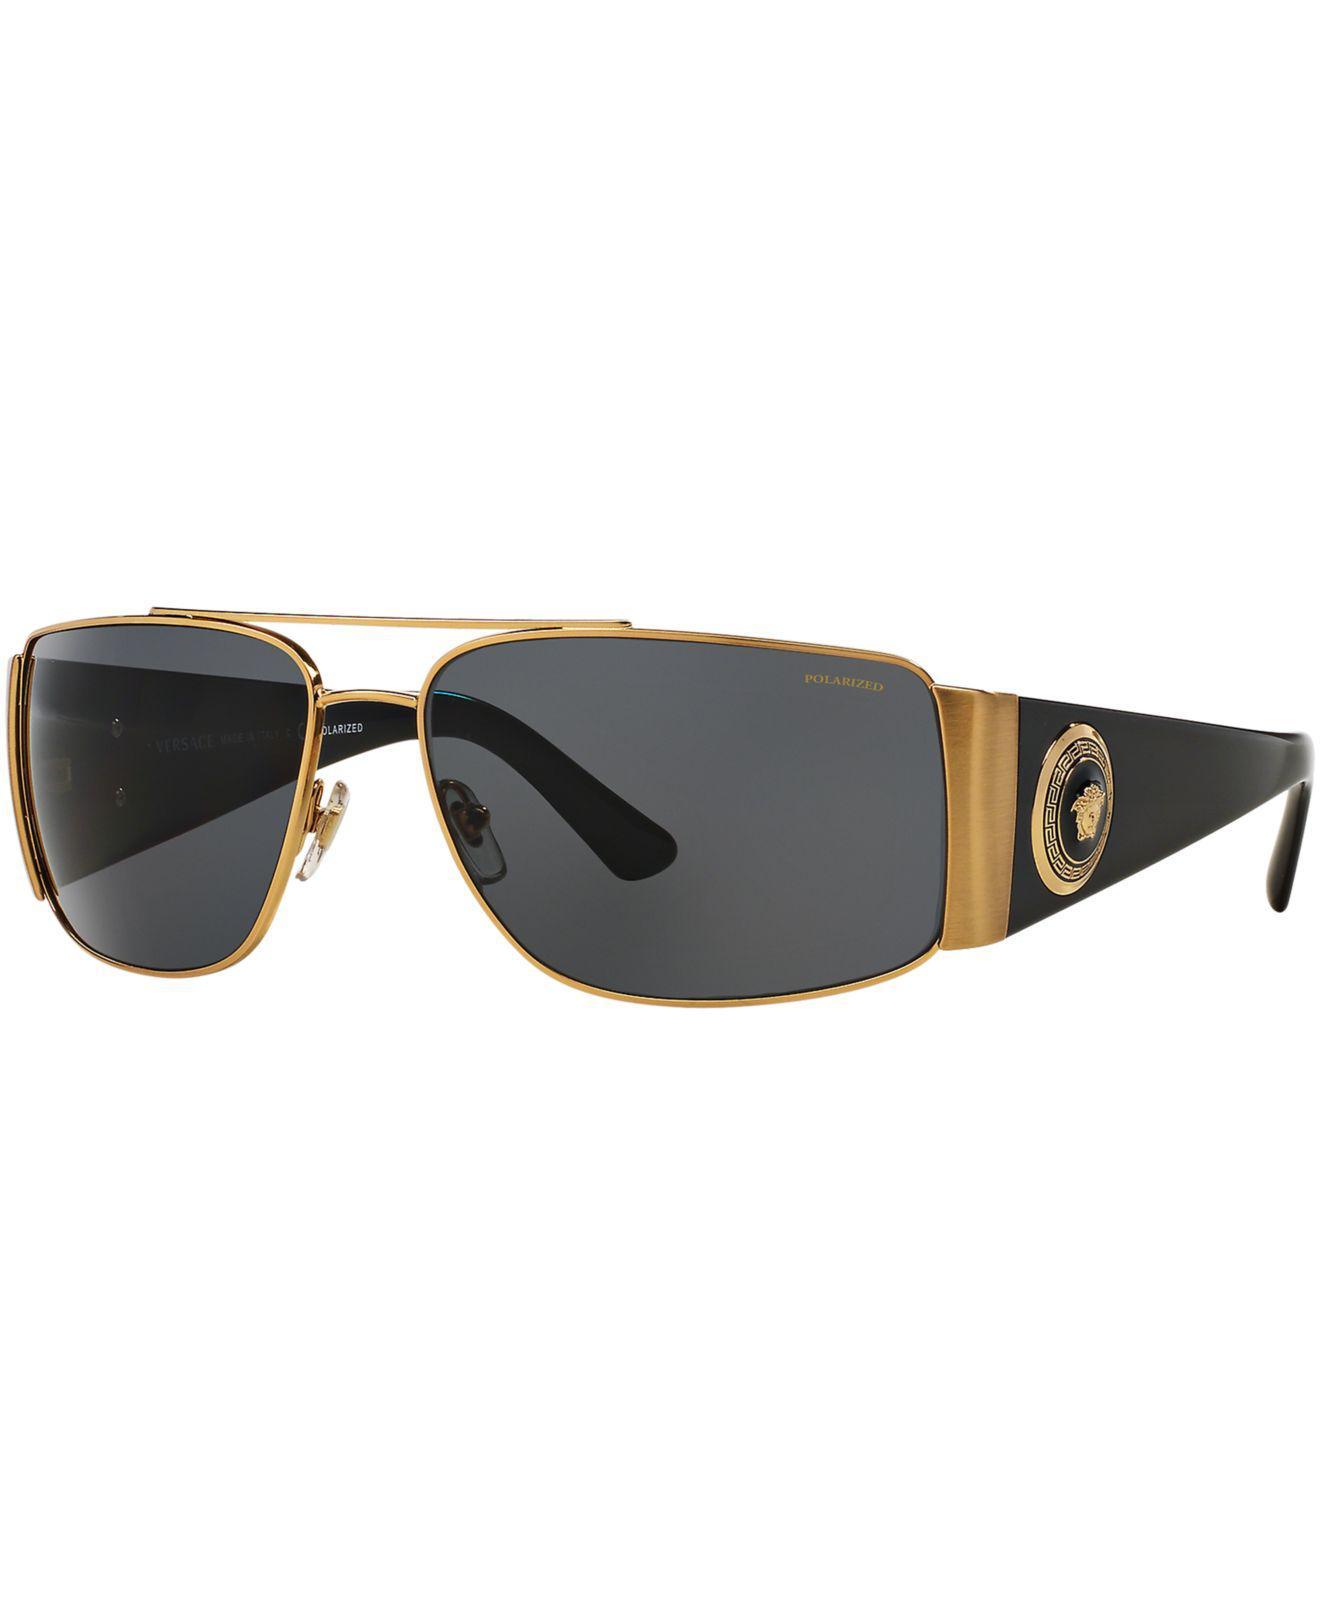 ab08a109a6 Versace. Men s Metallic Sunglasses ...